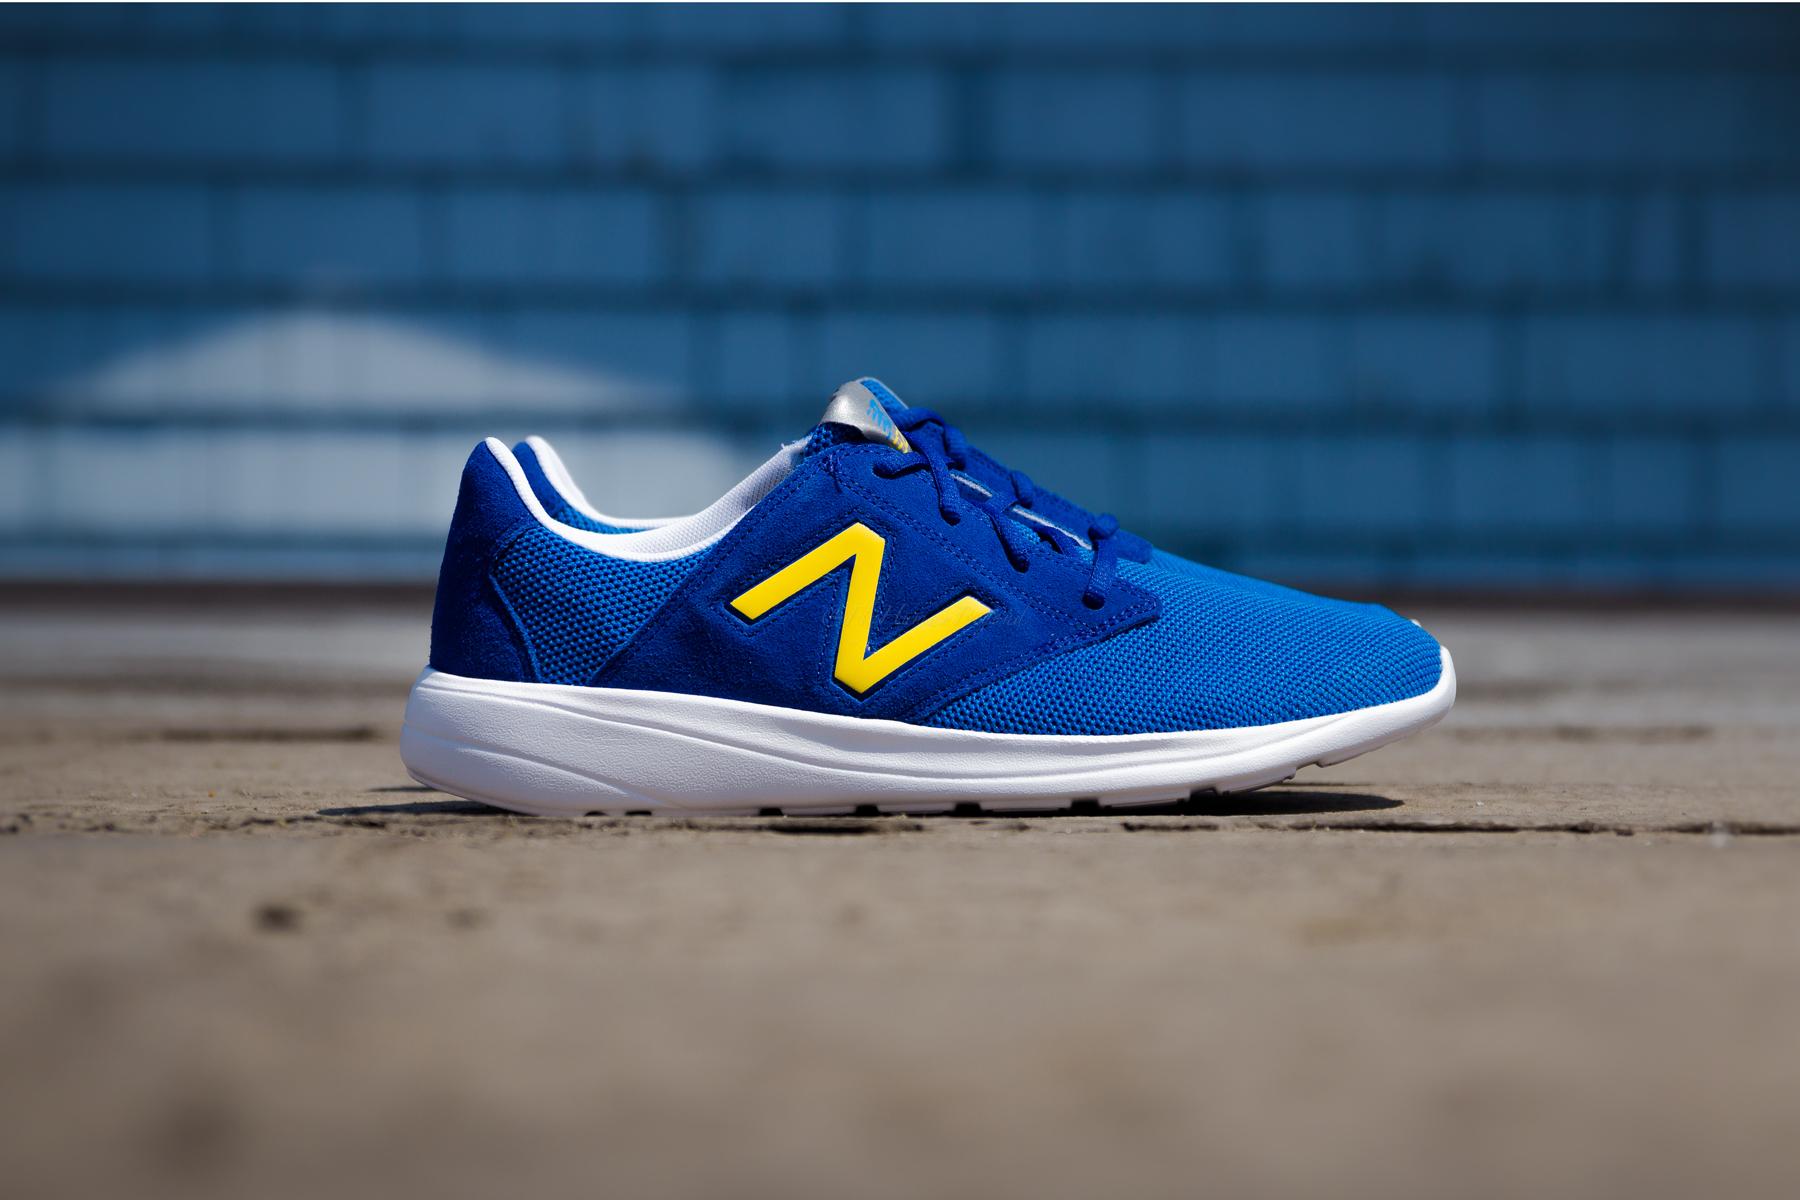 new balance 1320 collection